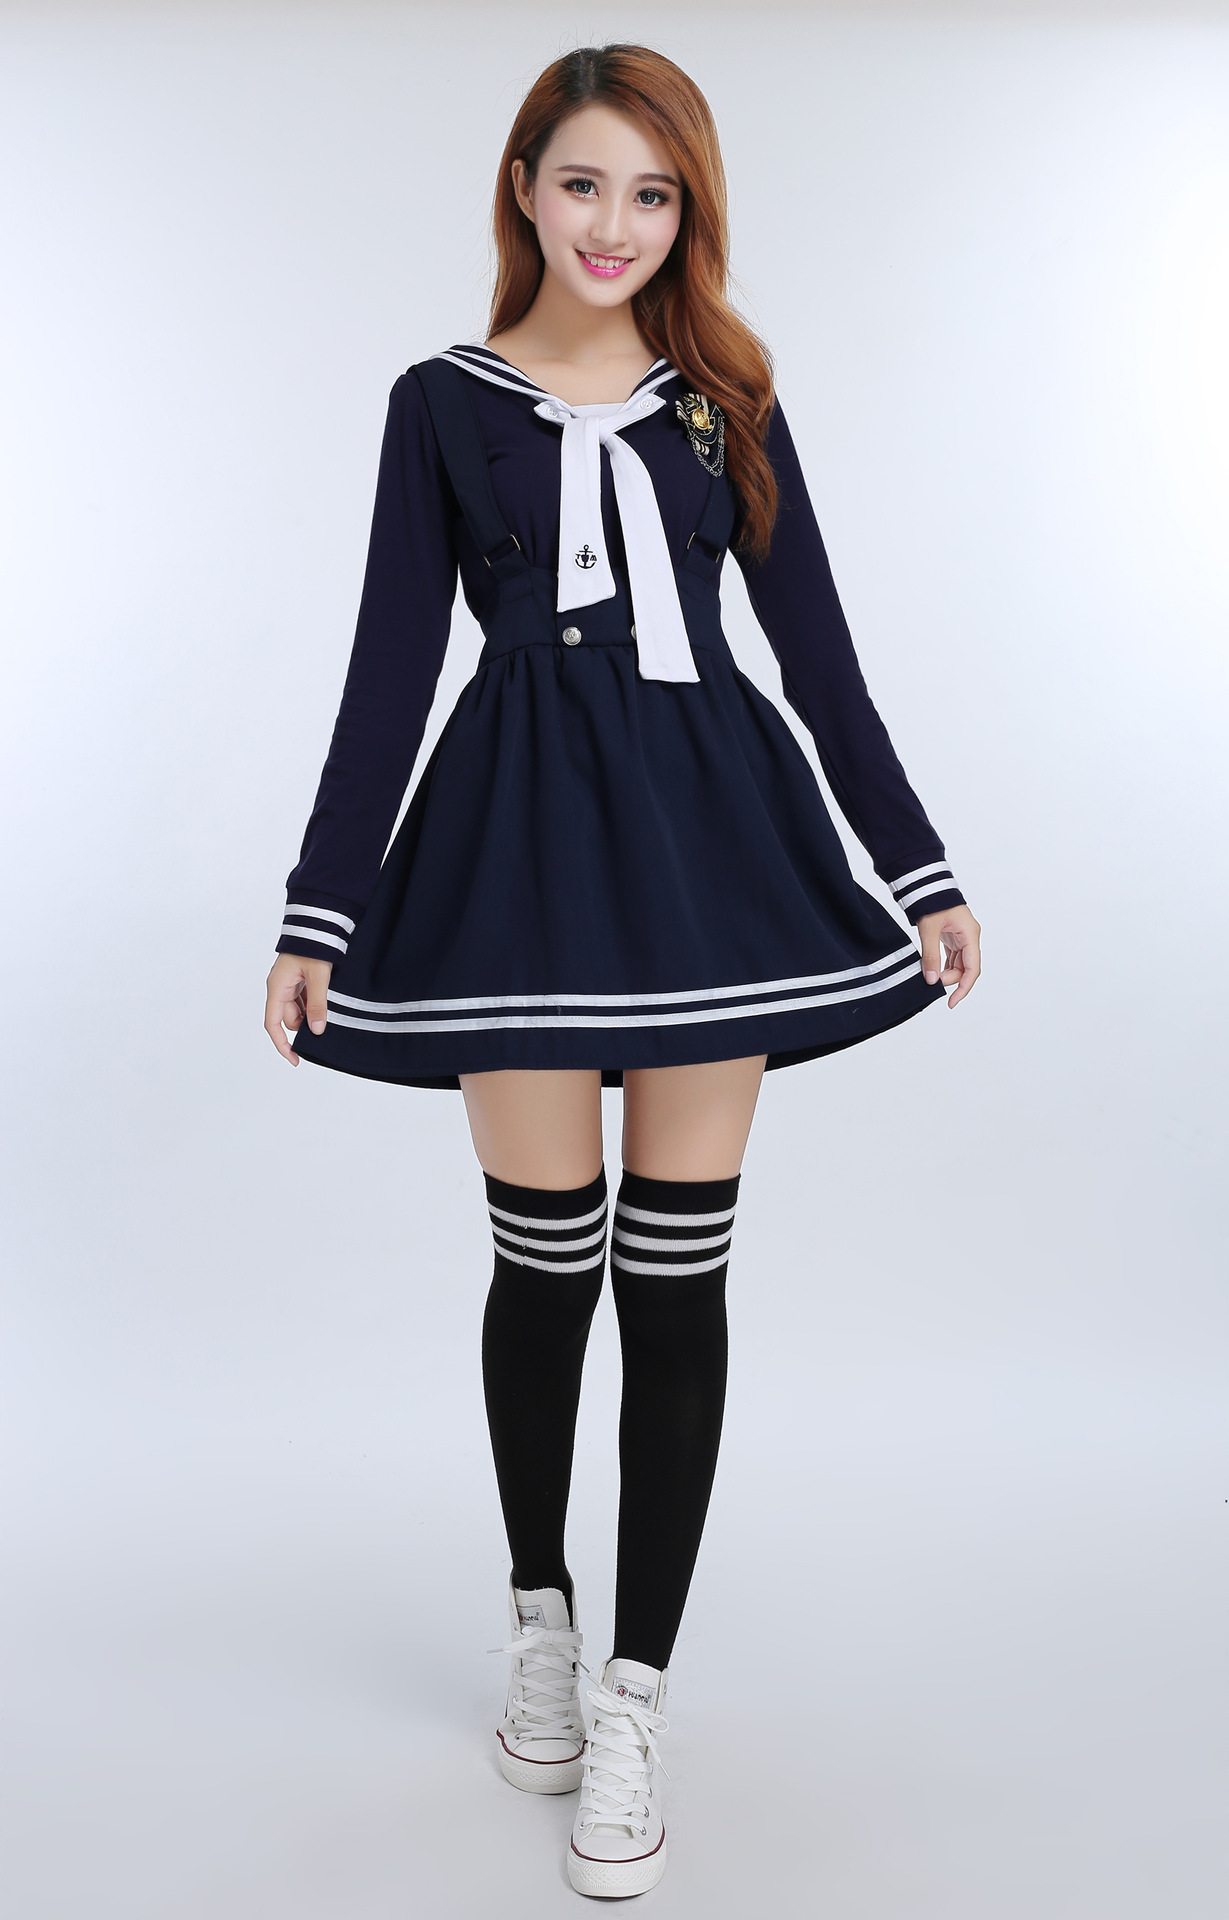 To Uniform 89